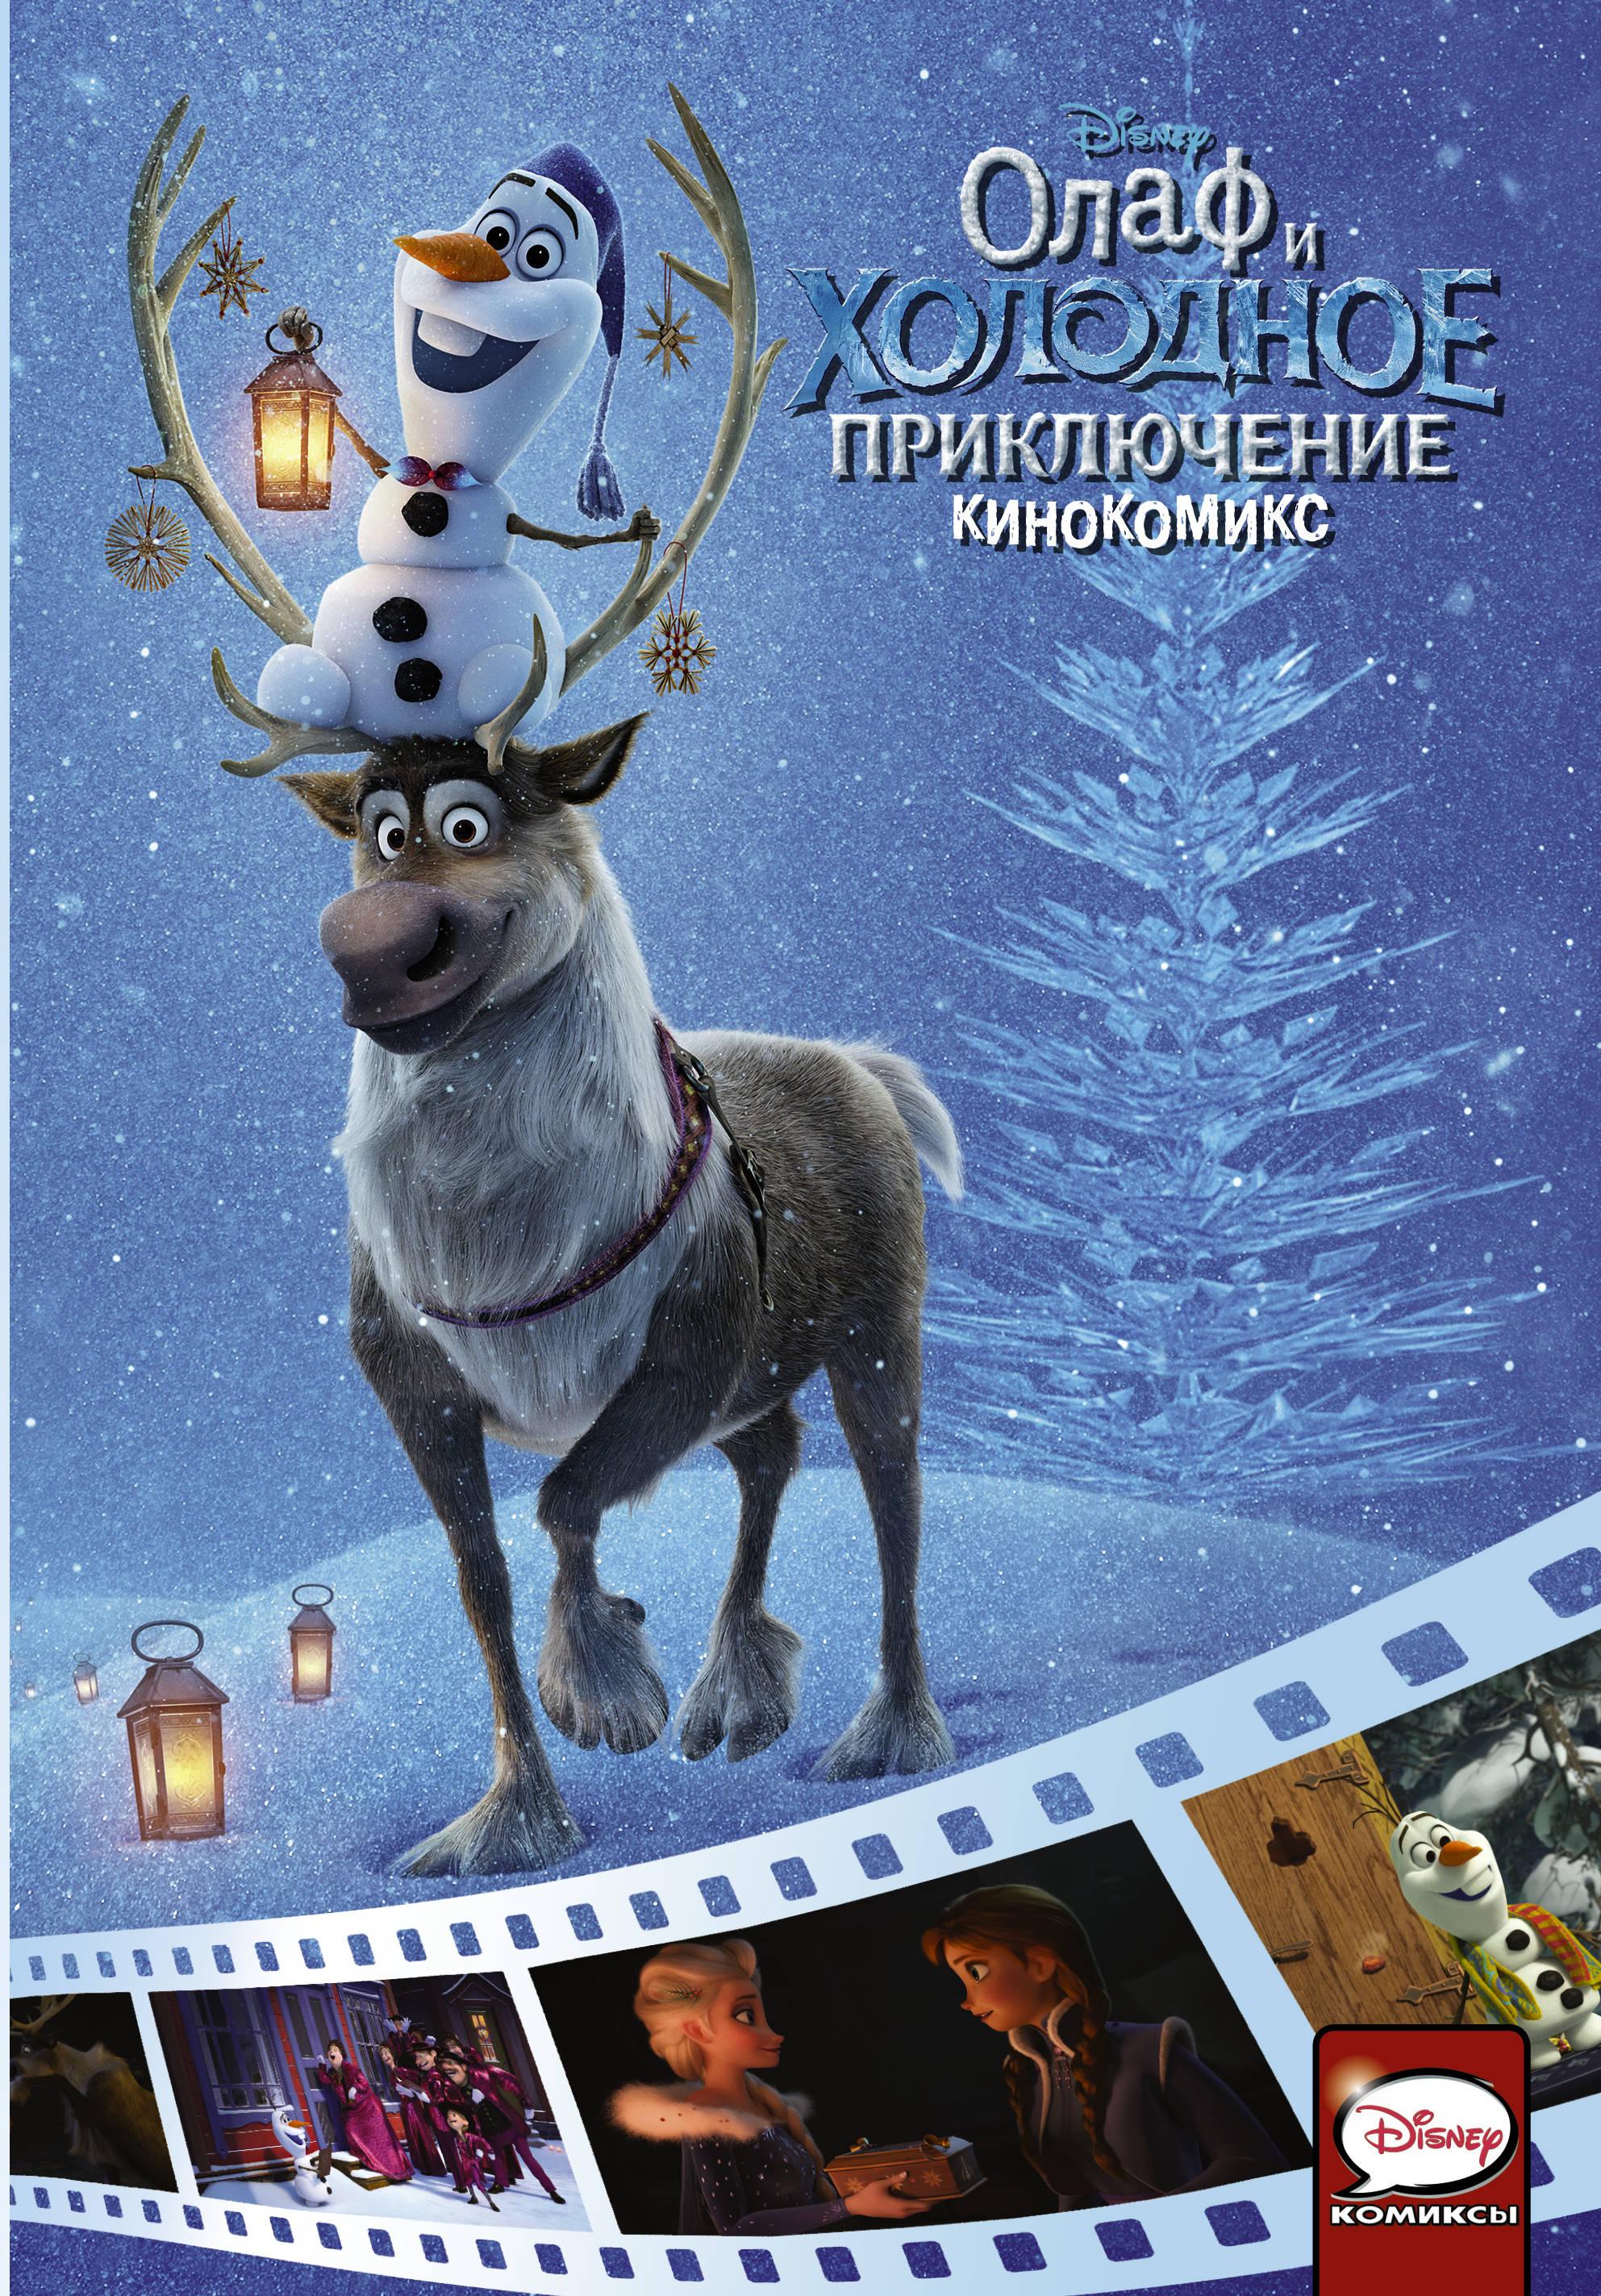 Olaf i kholodnoe prikljuchenie. Kinokomiks